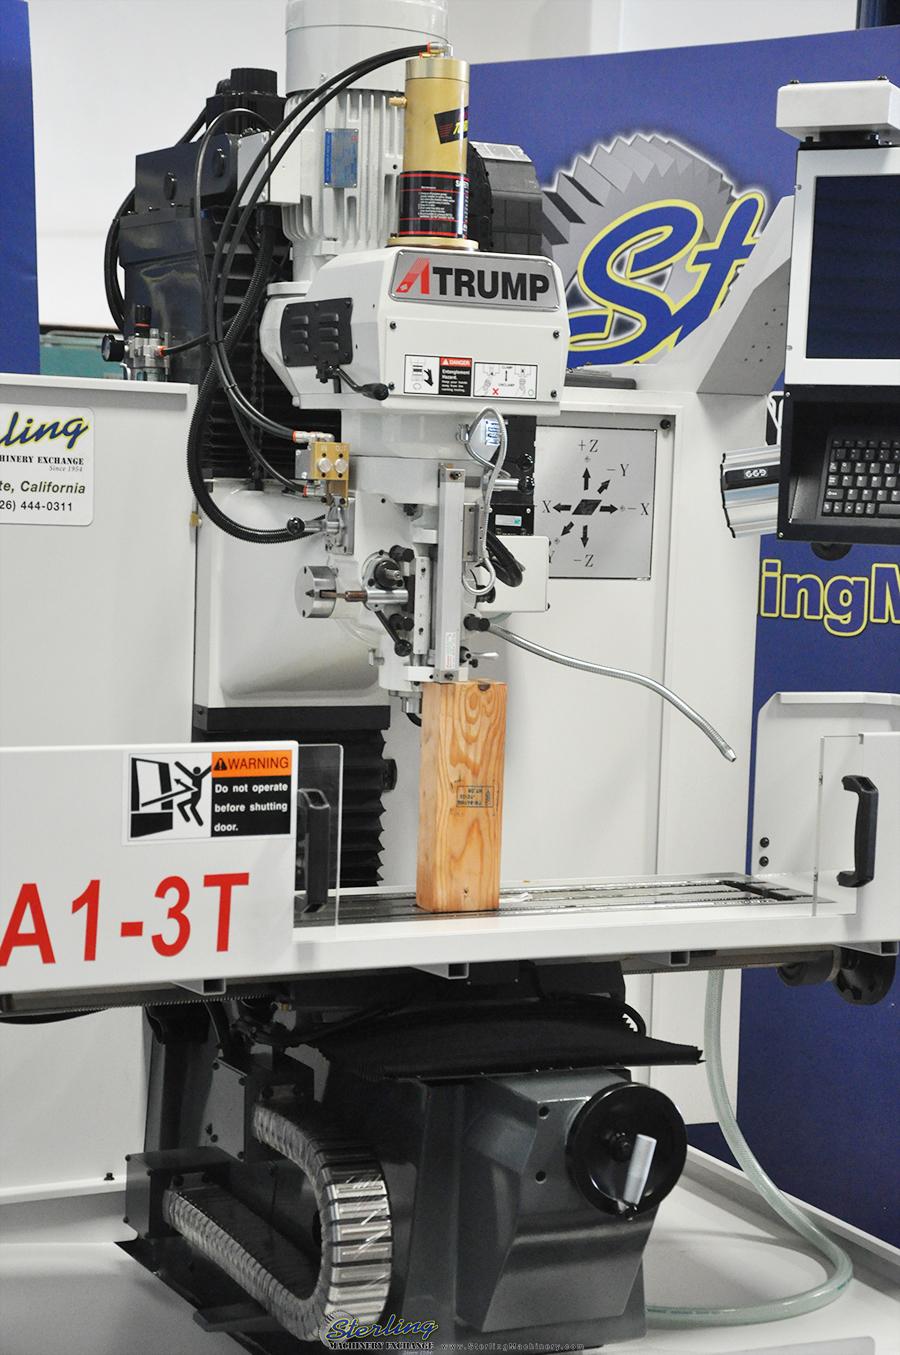 Brand New Atrump Cnc Bed Milling Machine Sterling Machinery